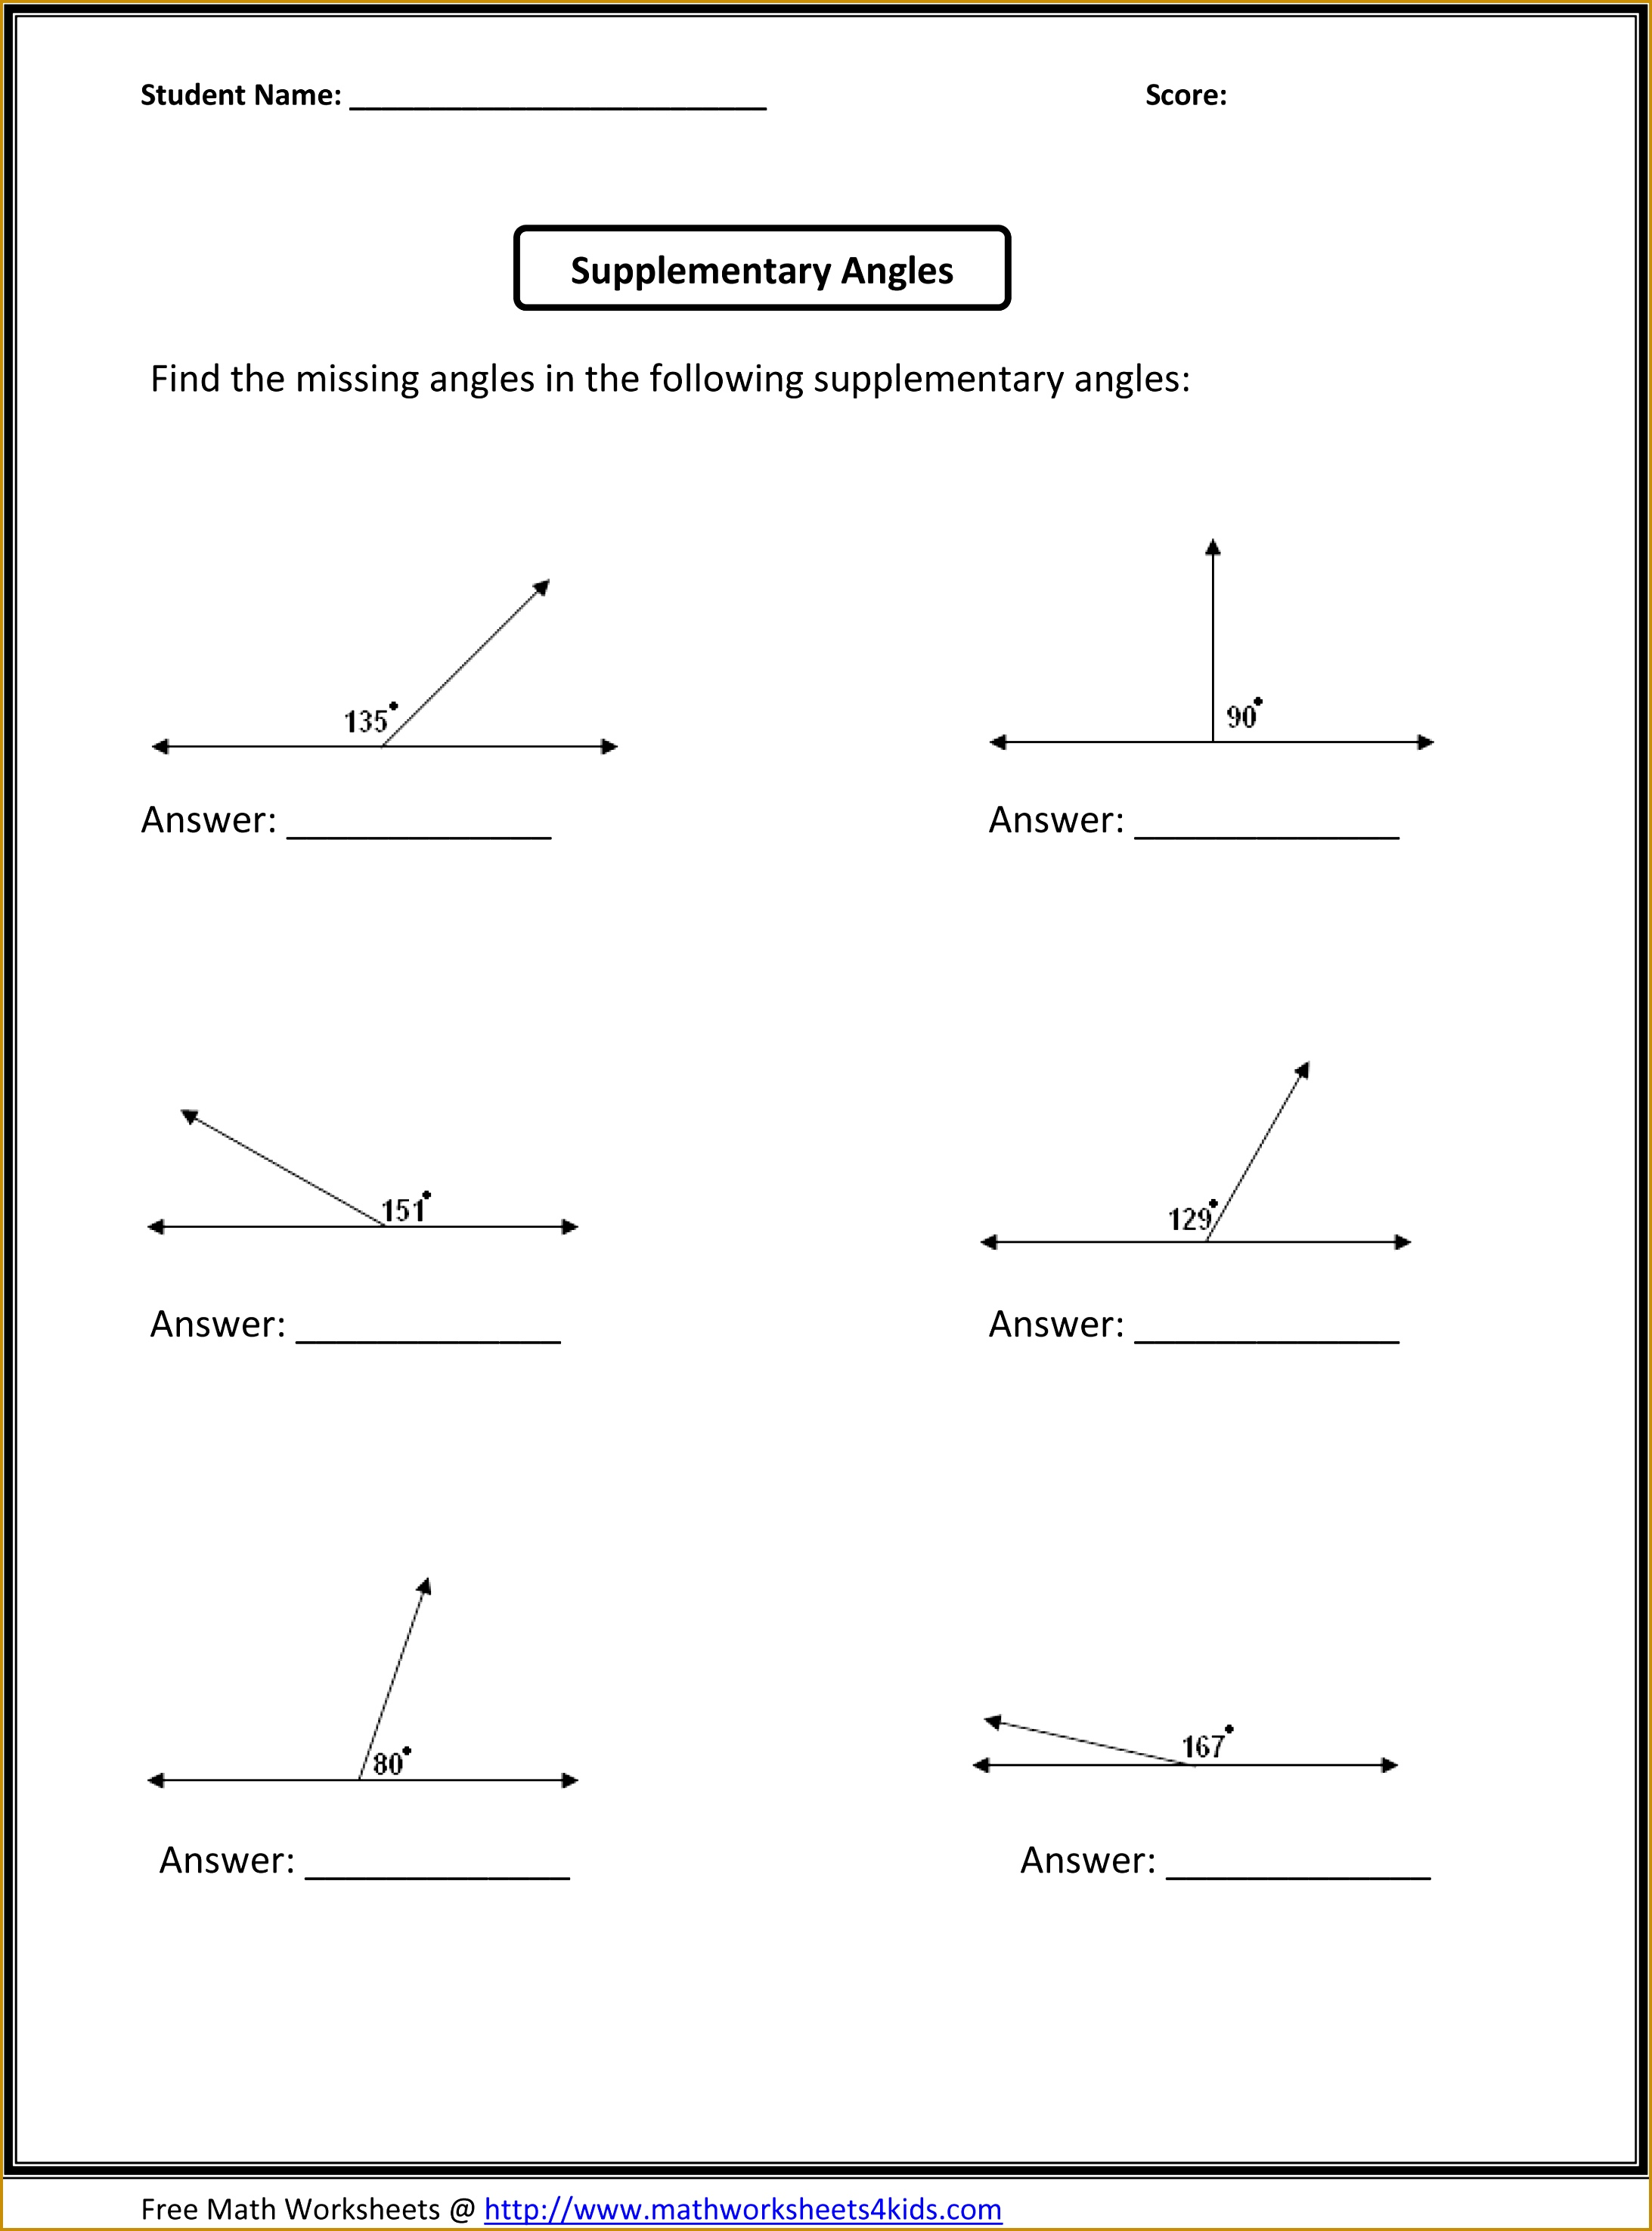 7 Math Worksheets Grade 5